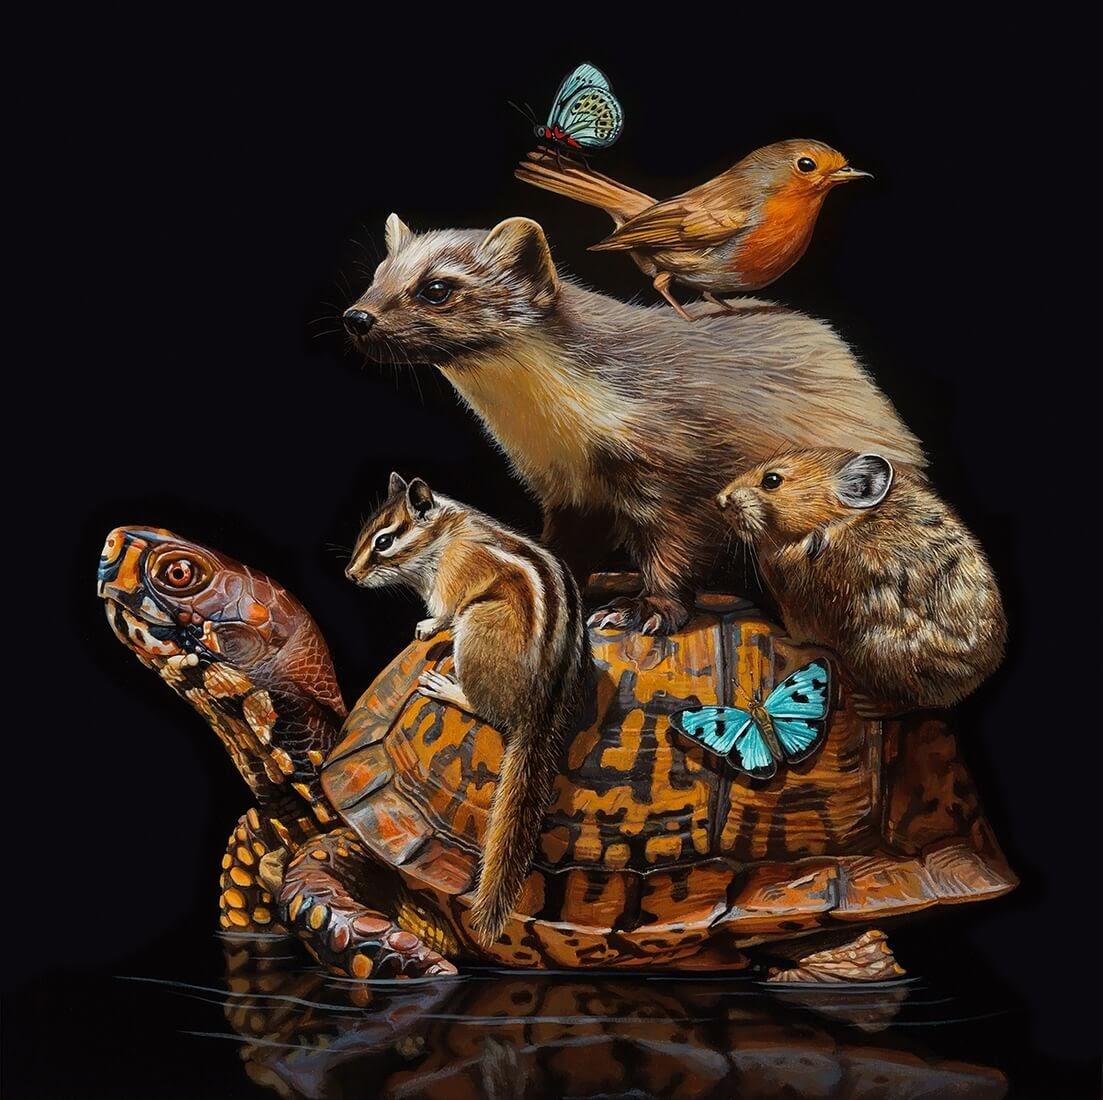 07-Mobile-Habitats-Lisa-Ericson-Animals-Interspecies-Friendships-Paintings-www-designstack-co